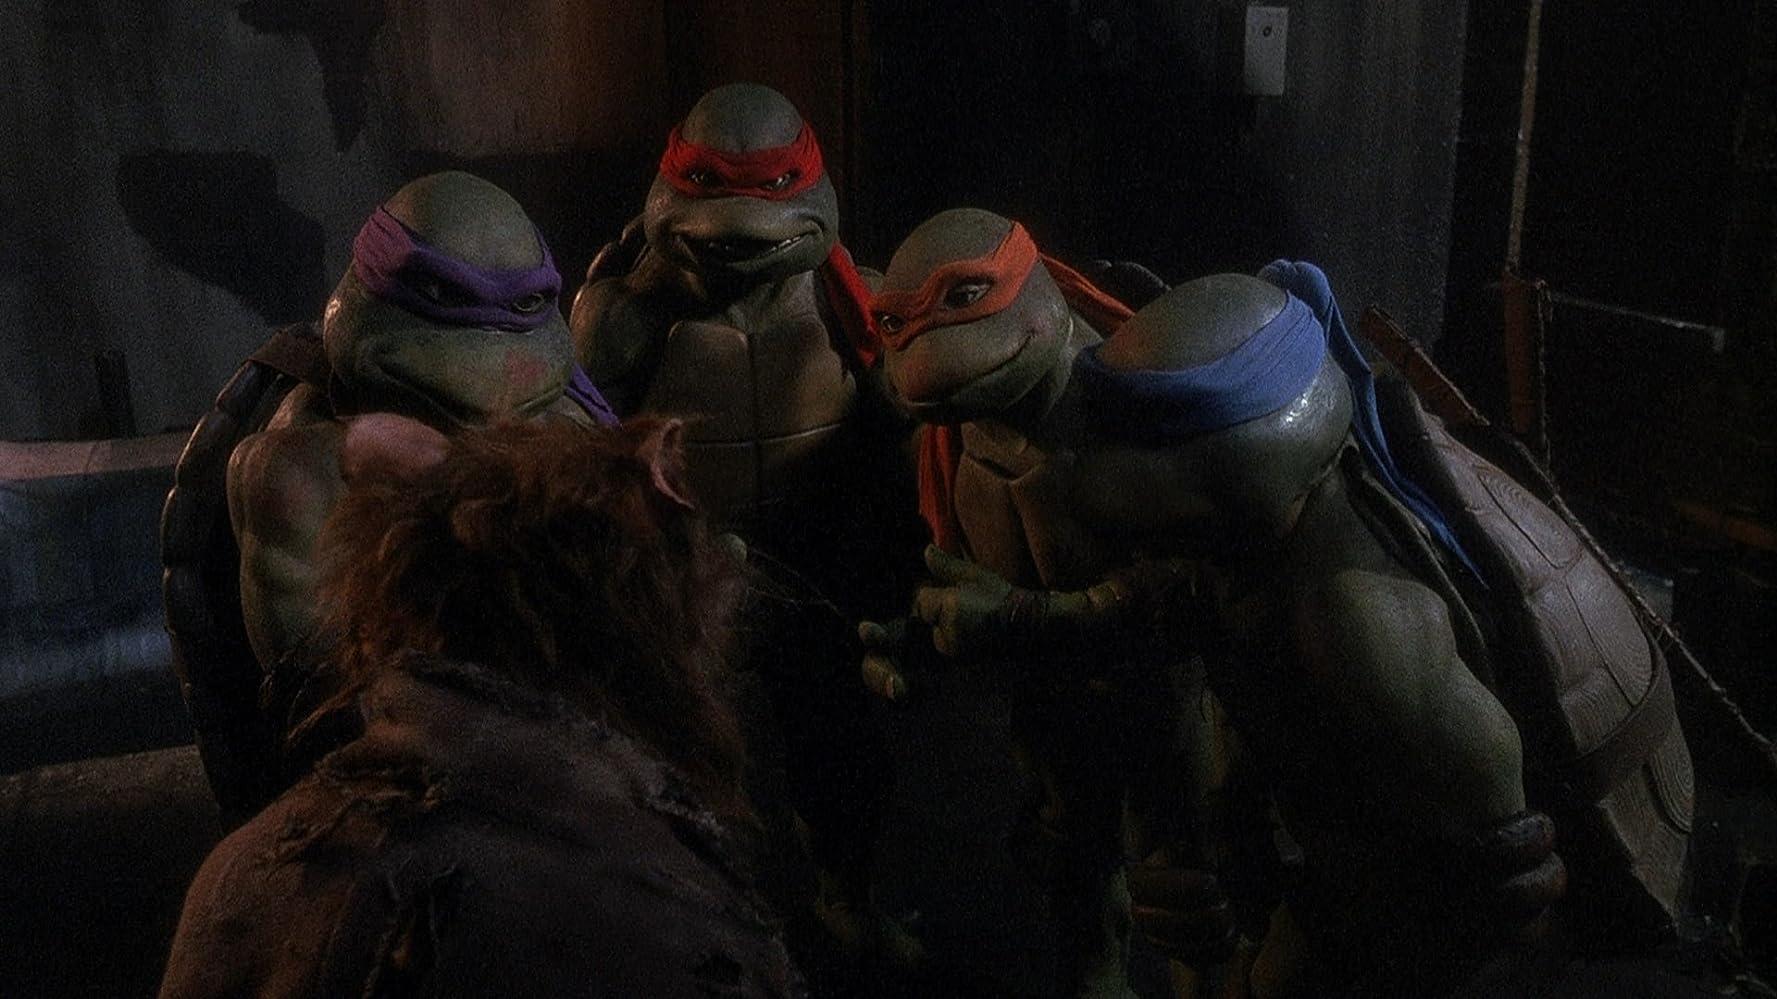 Kevin Clash, David Forman, Josh Pais, Michelan Sisti, and Leif Tilden in Teenage Mutant Ninja Turtles (1990)